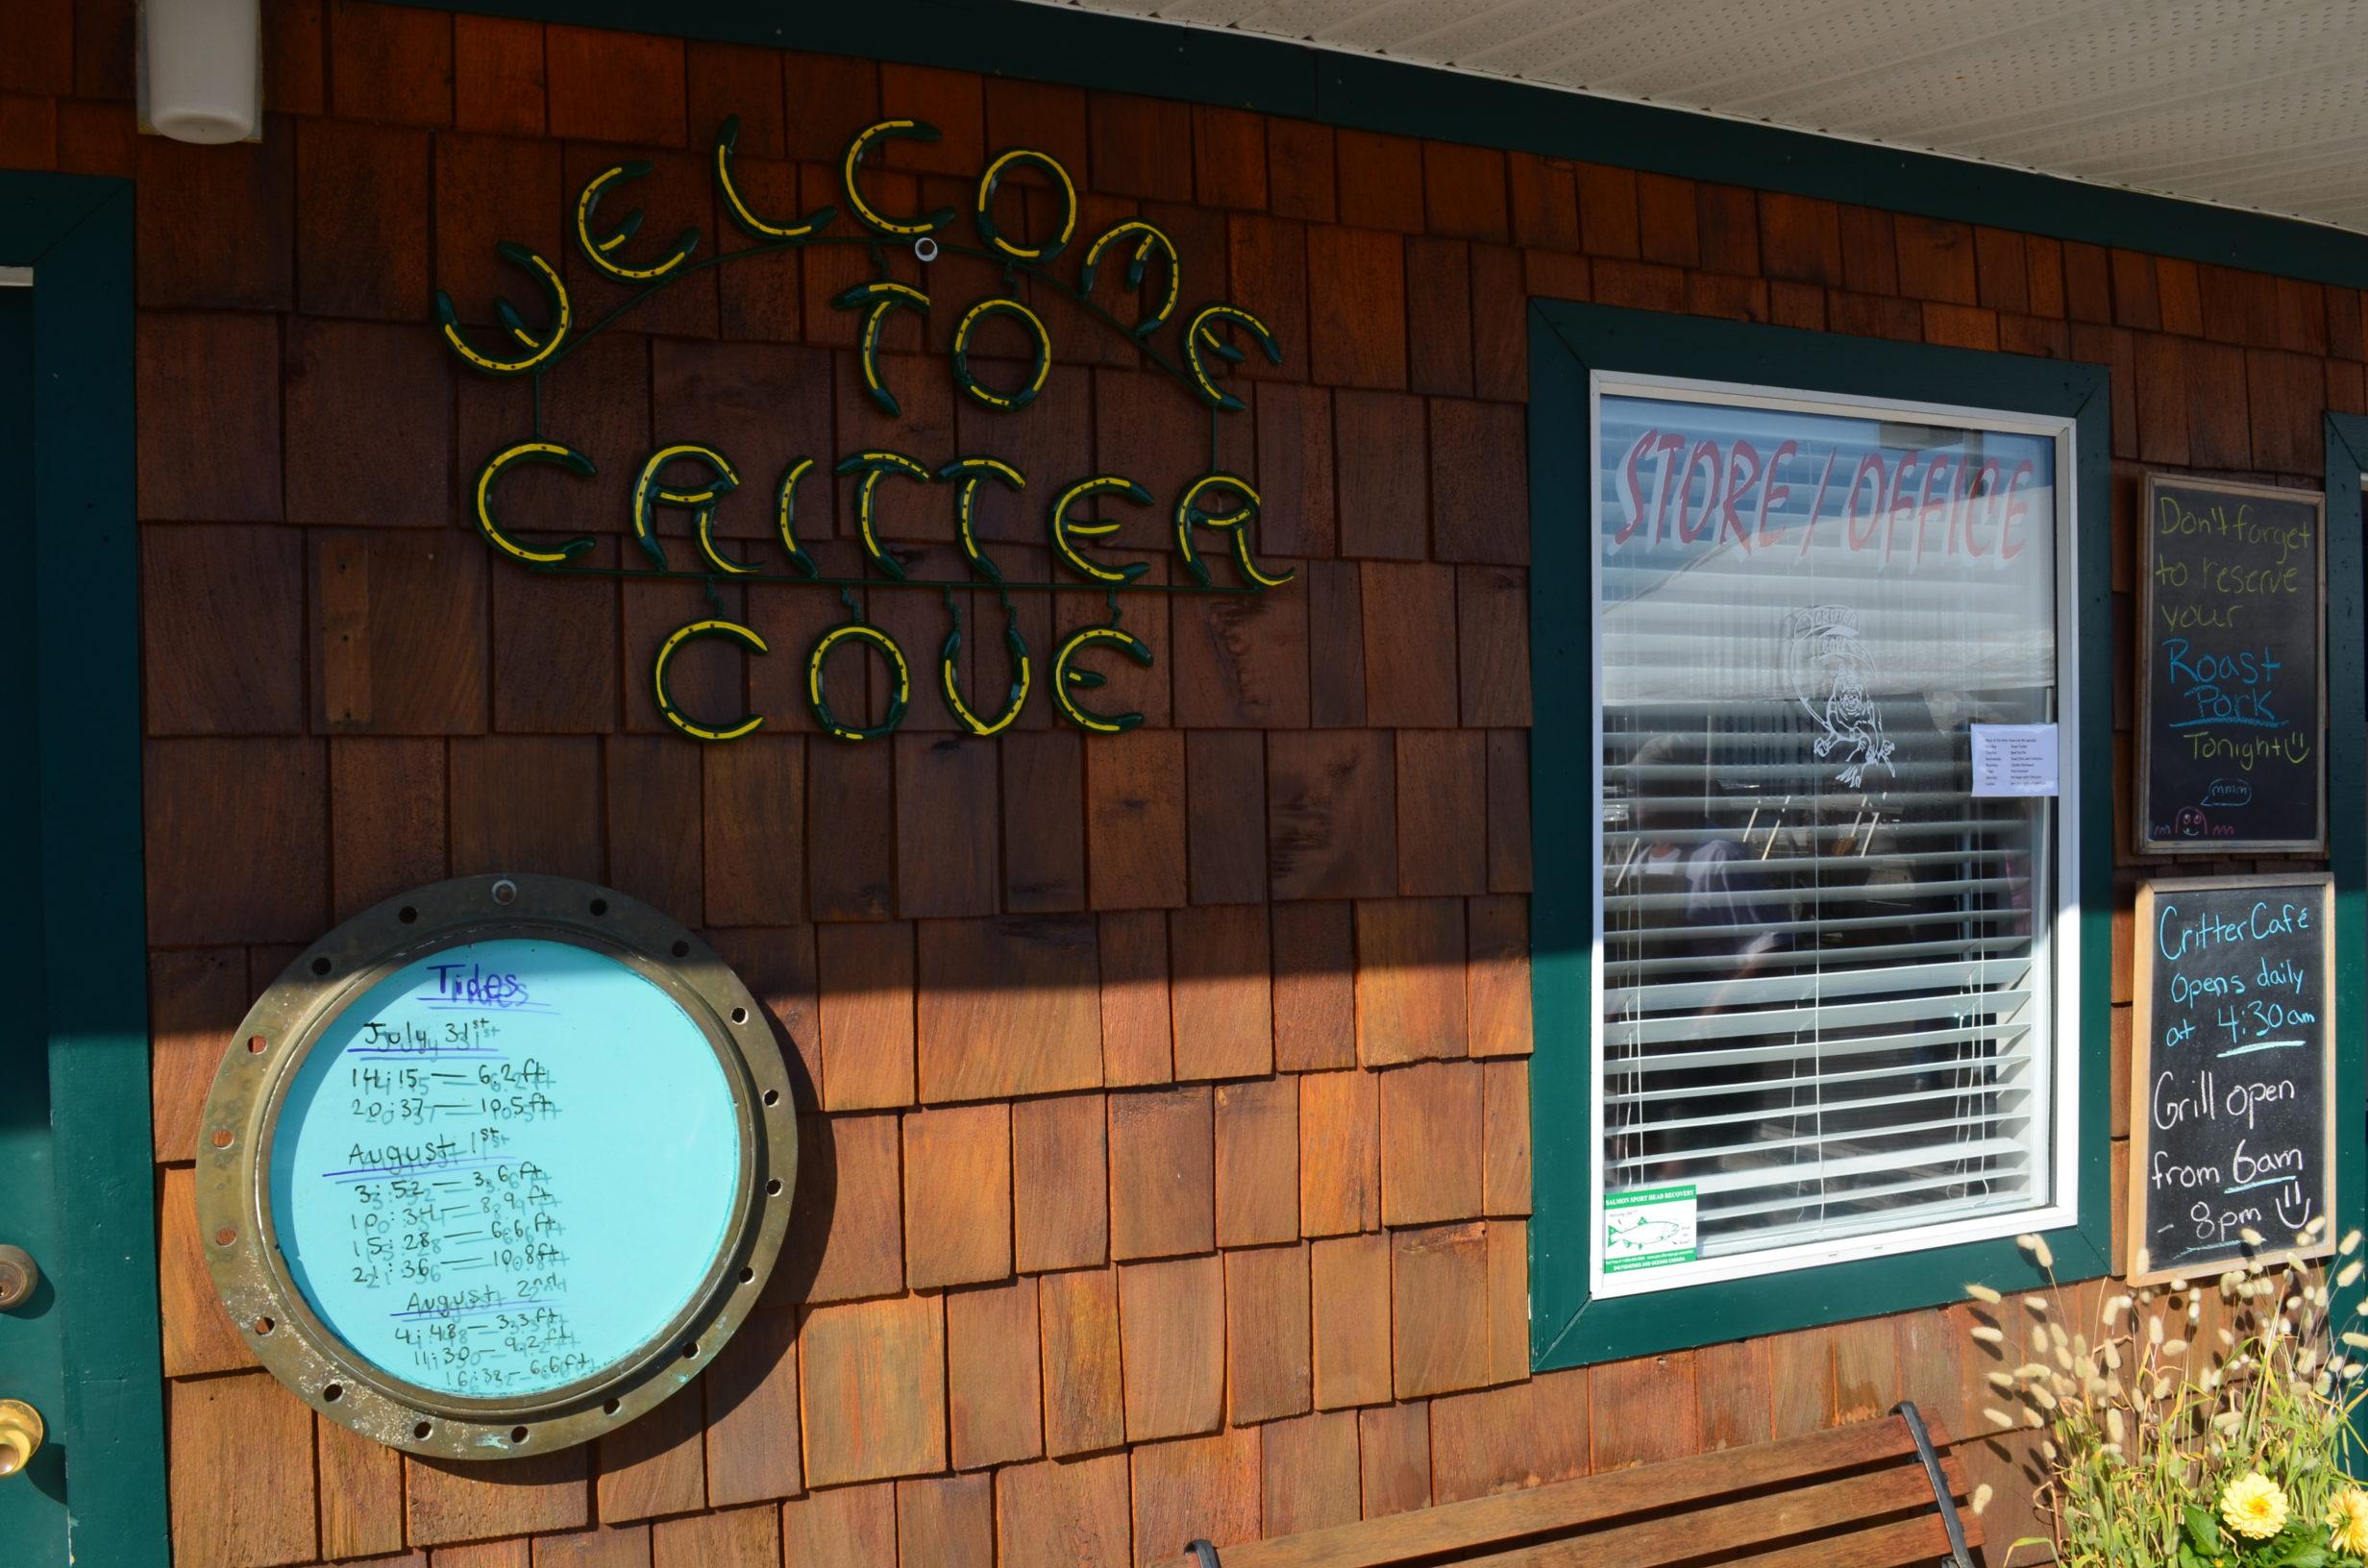 Critter Cove